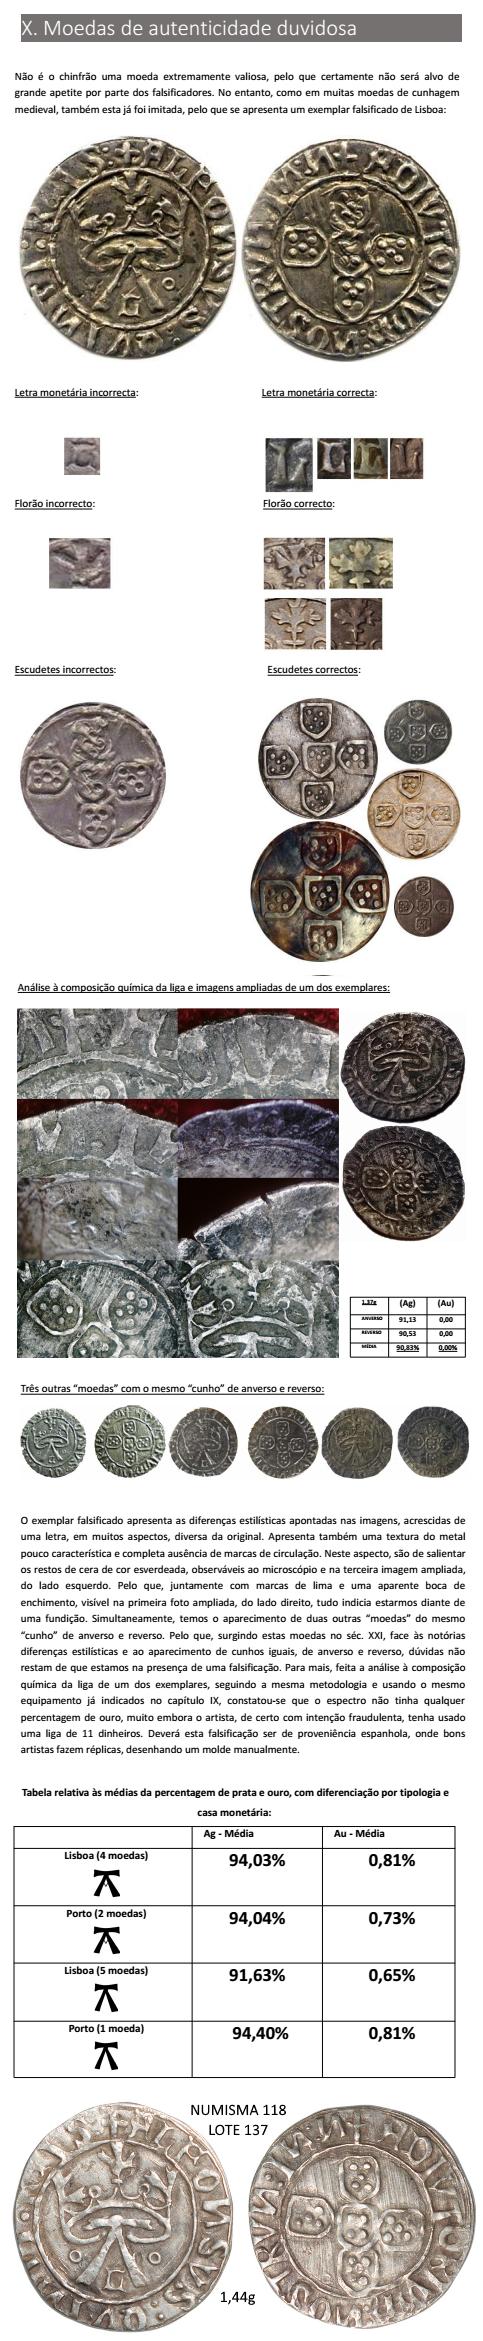 chinfr-o-falso-numisma-118